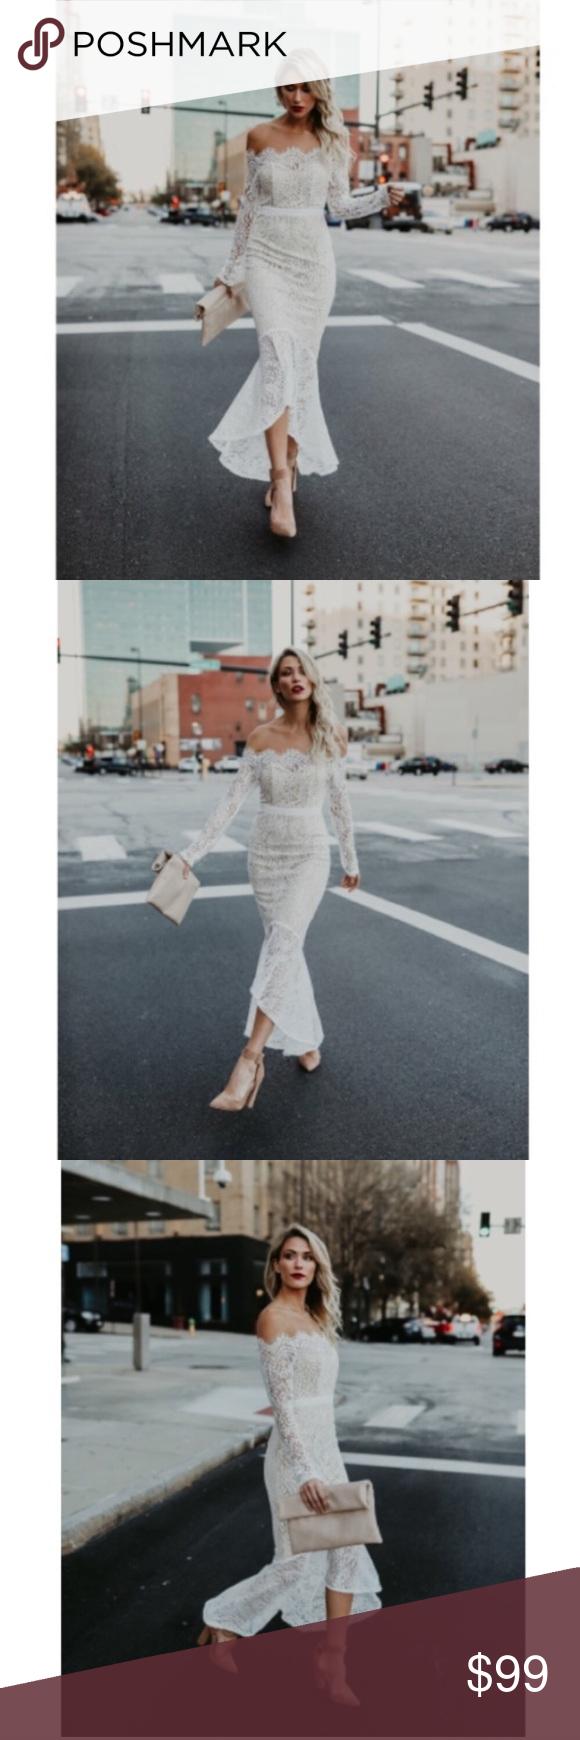 Vici White Elegant Lace Trumpet Dress Dresses Trumpet Dress Tight Wedding Dress [ 1740 x 580 Pixel ]